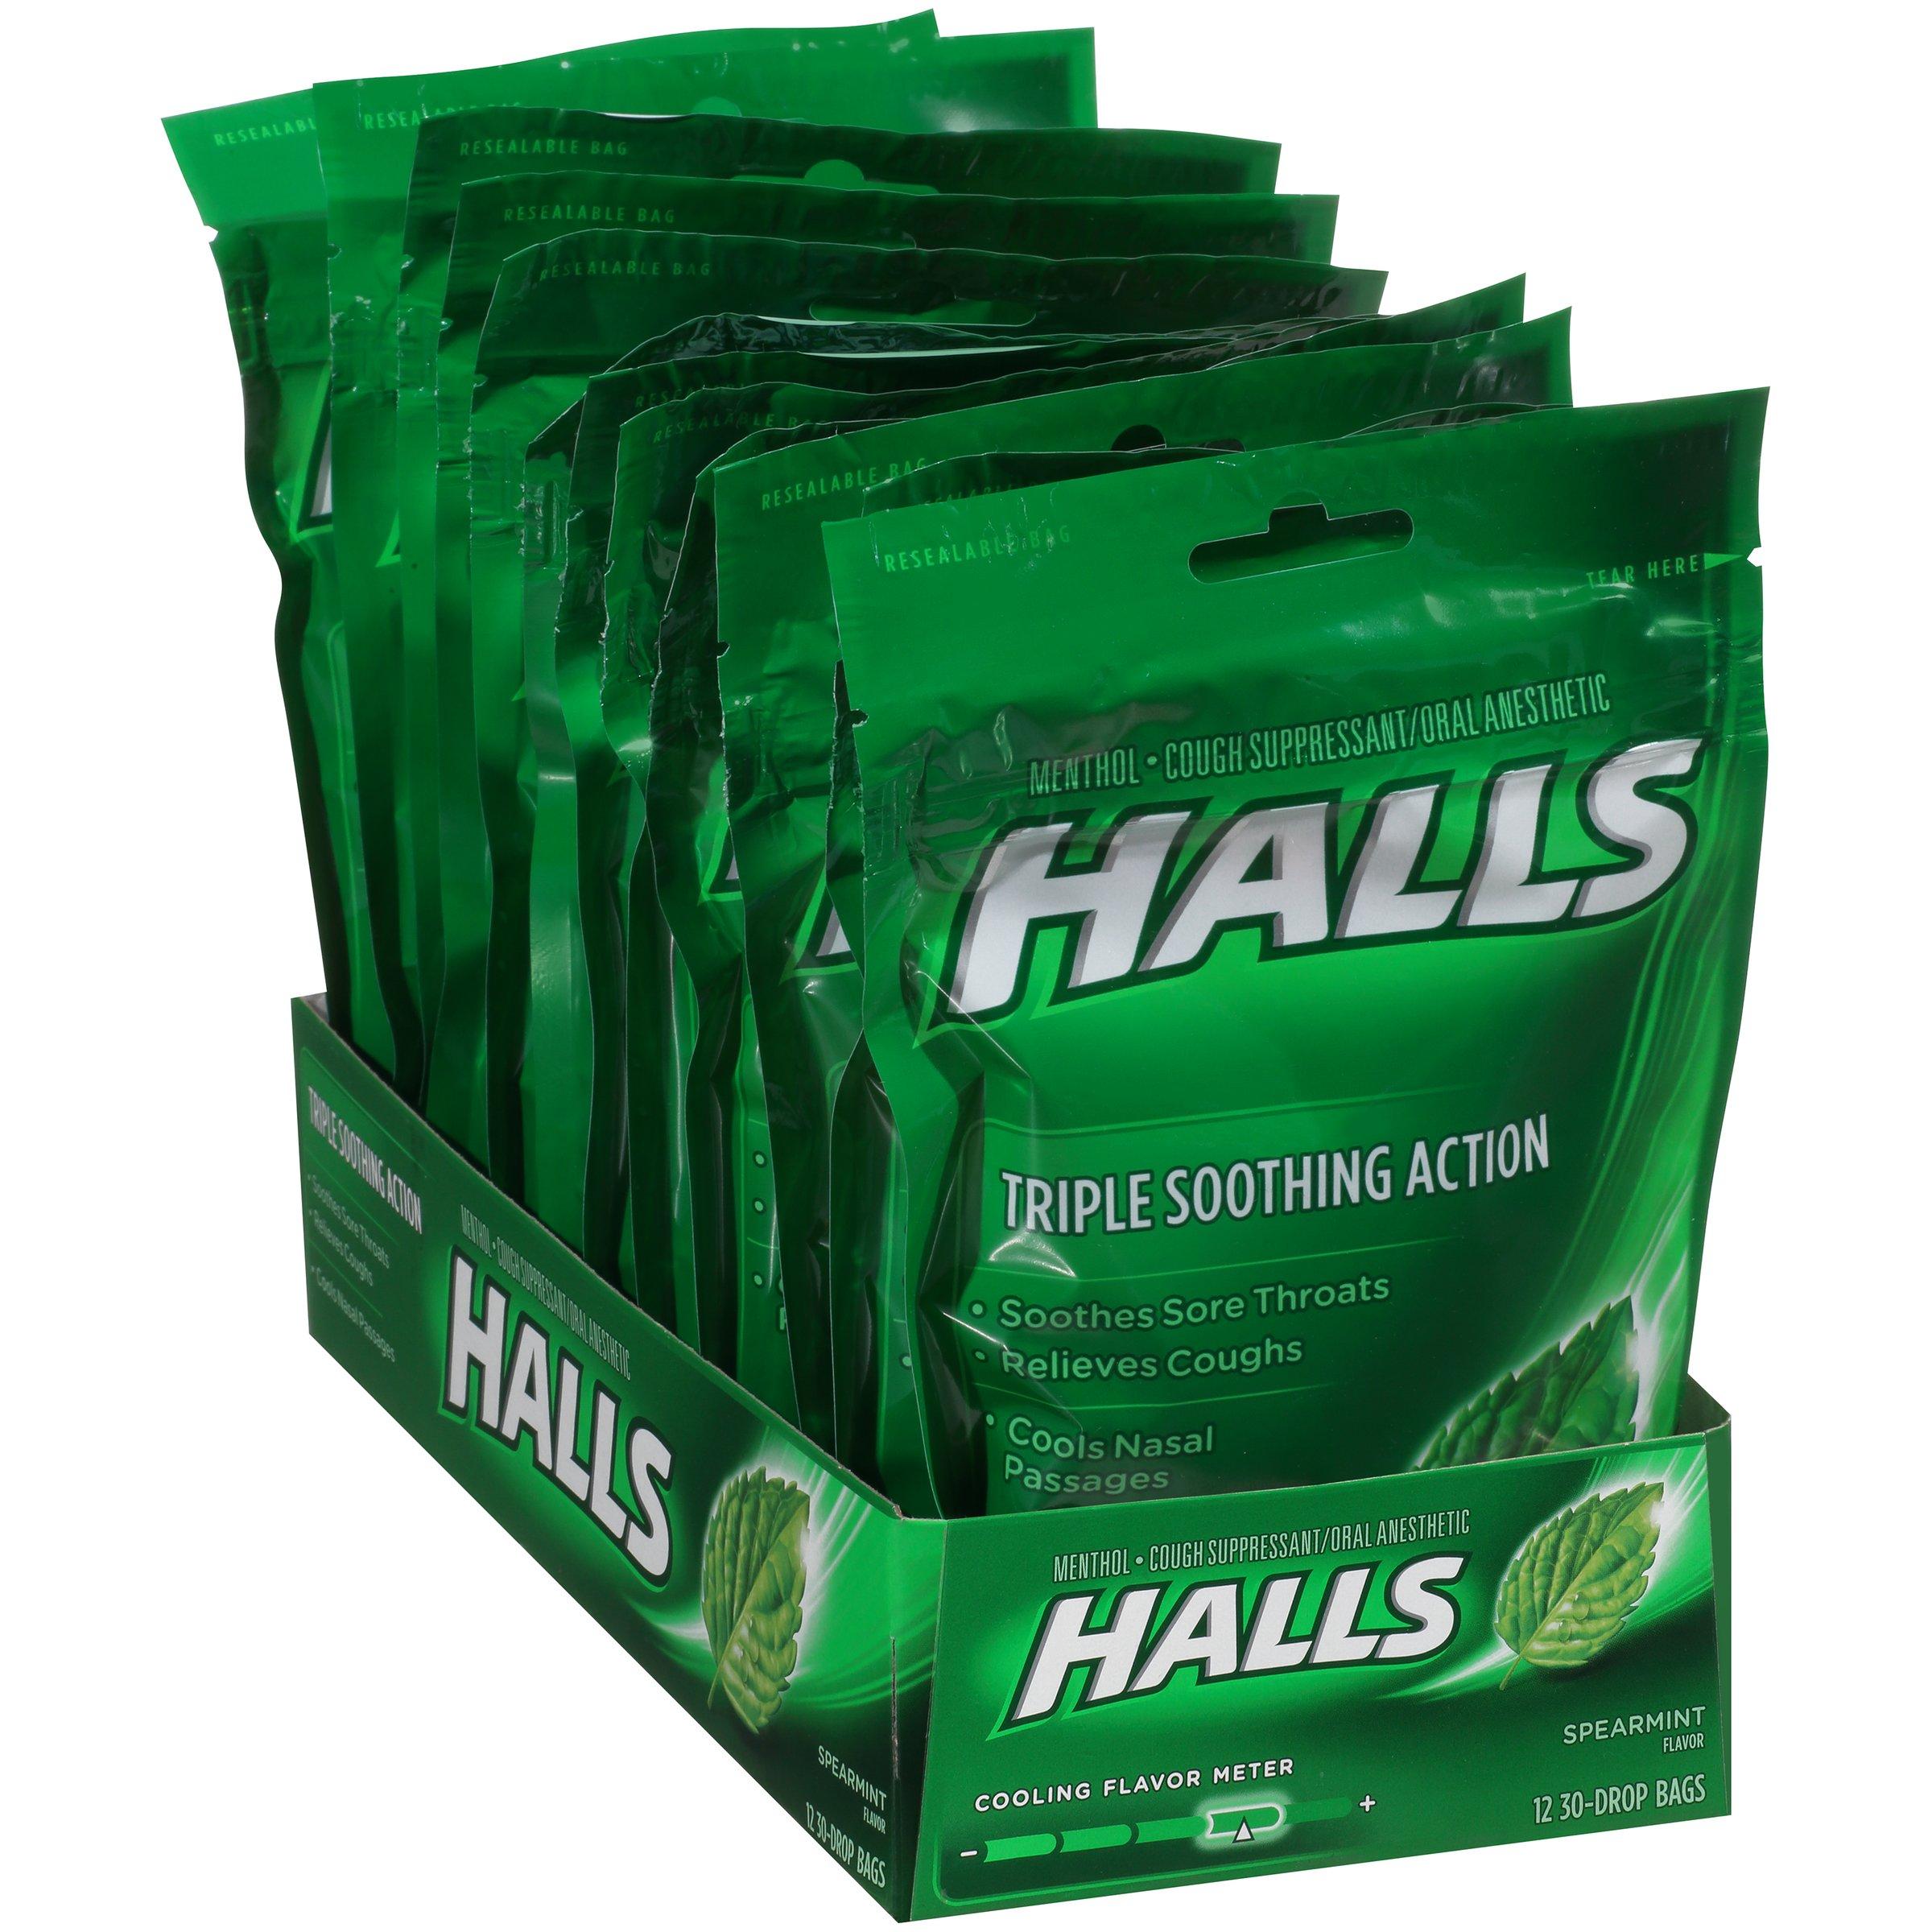 Halls Cough Drops, (Spearmint, 30 Drops, 12-Pack) by Halls